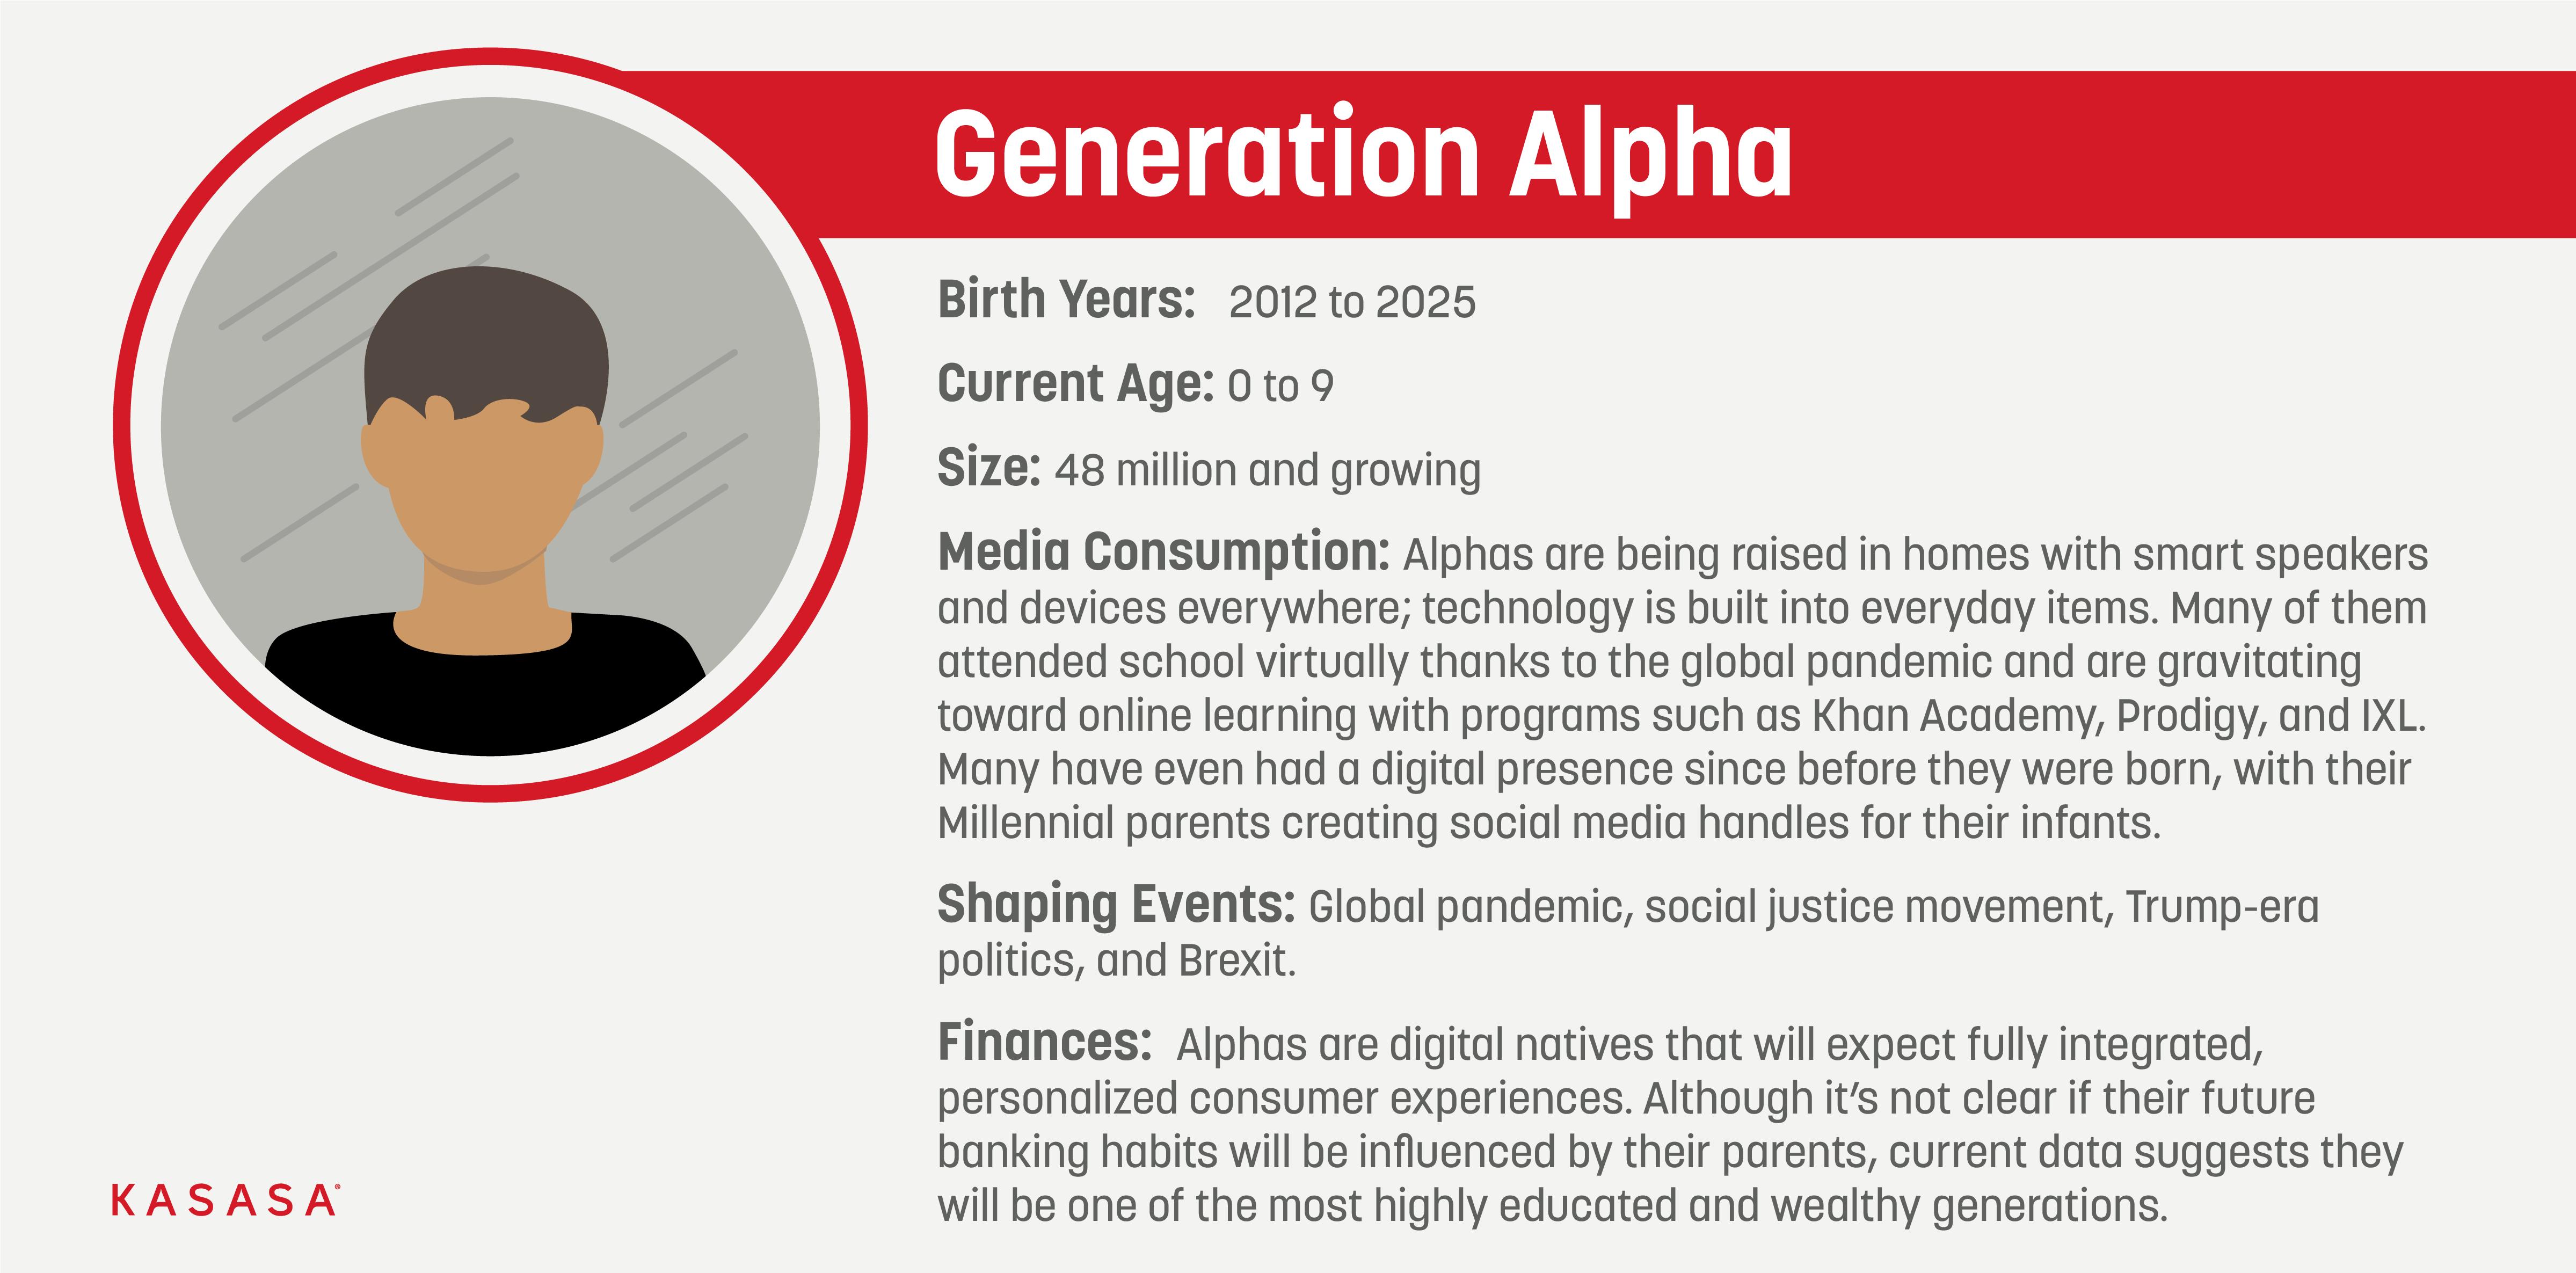 Gen A - Generation Alpha